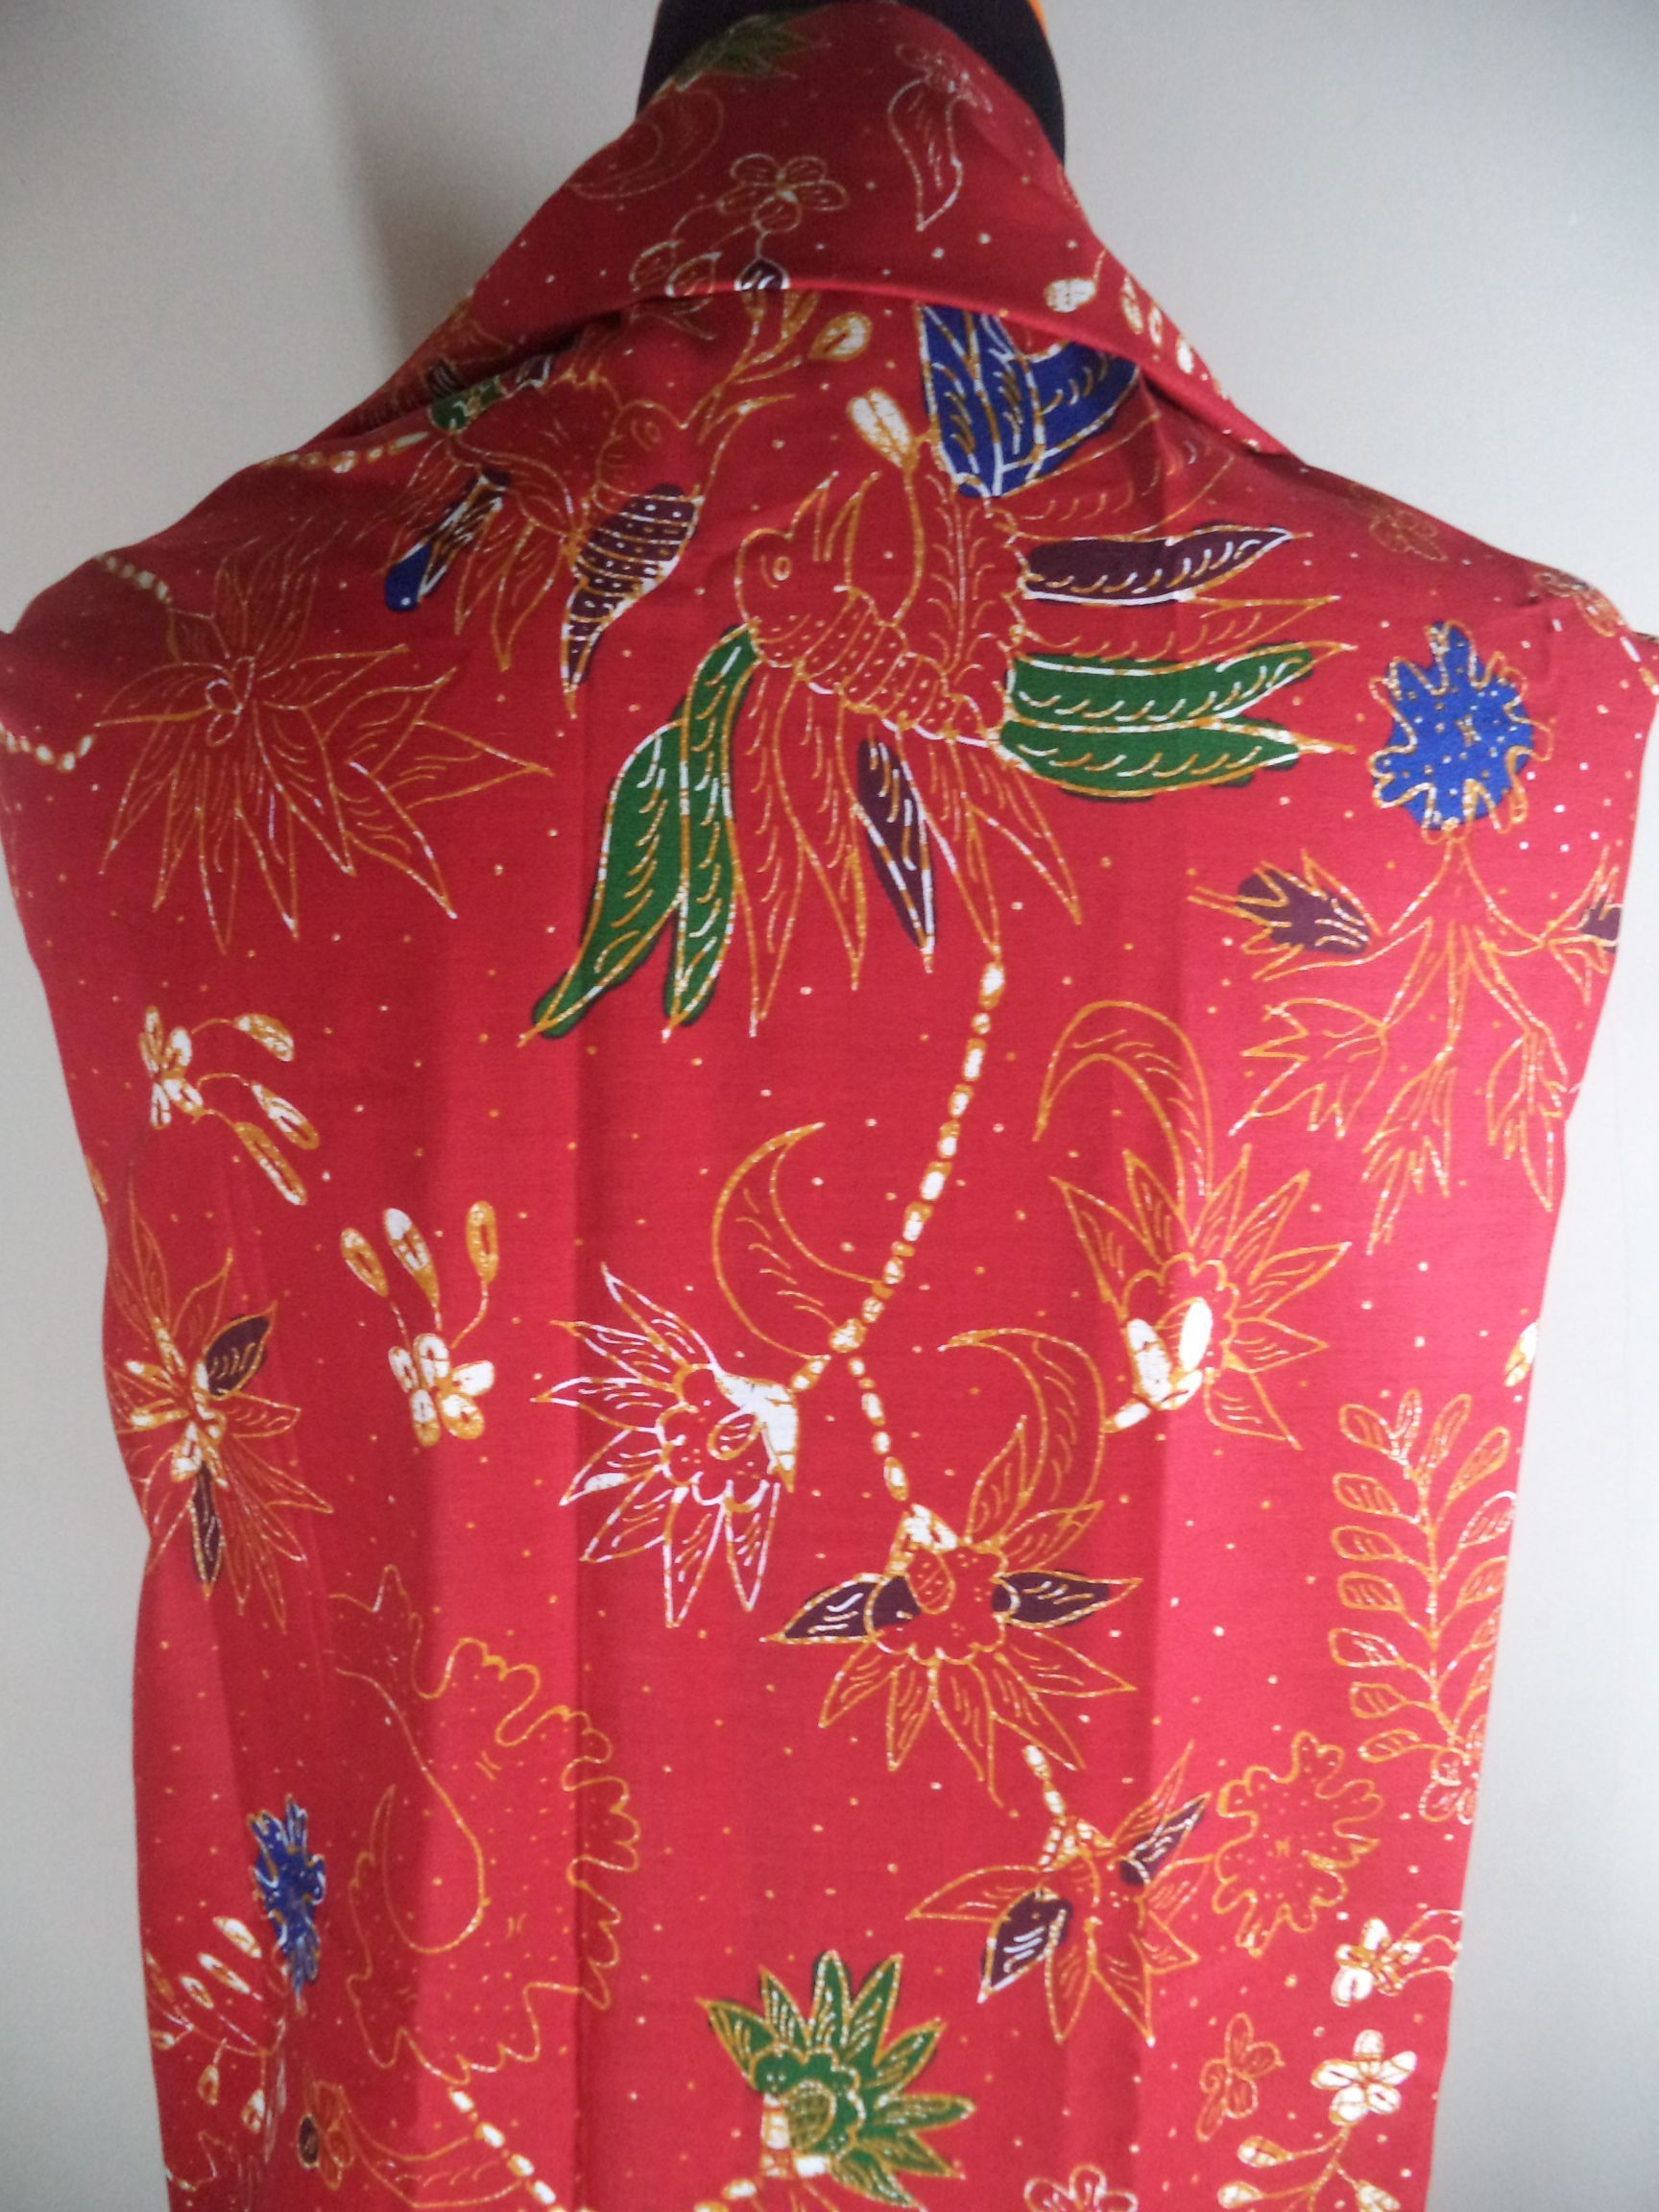 Kain Batik Motif Bunga Warna-warni Batik Cap tradisional handmade, bahan katun, ukuran: 1,15 x 2m